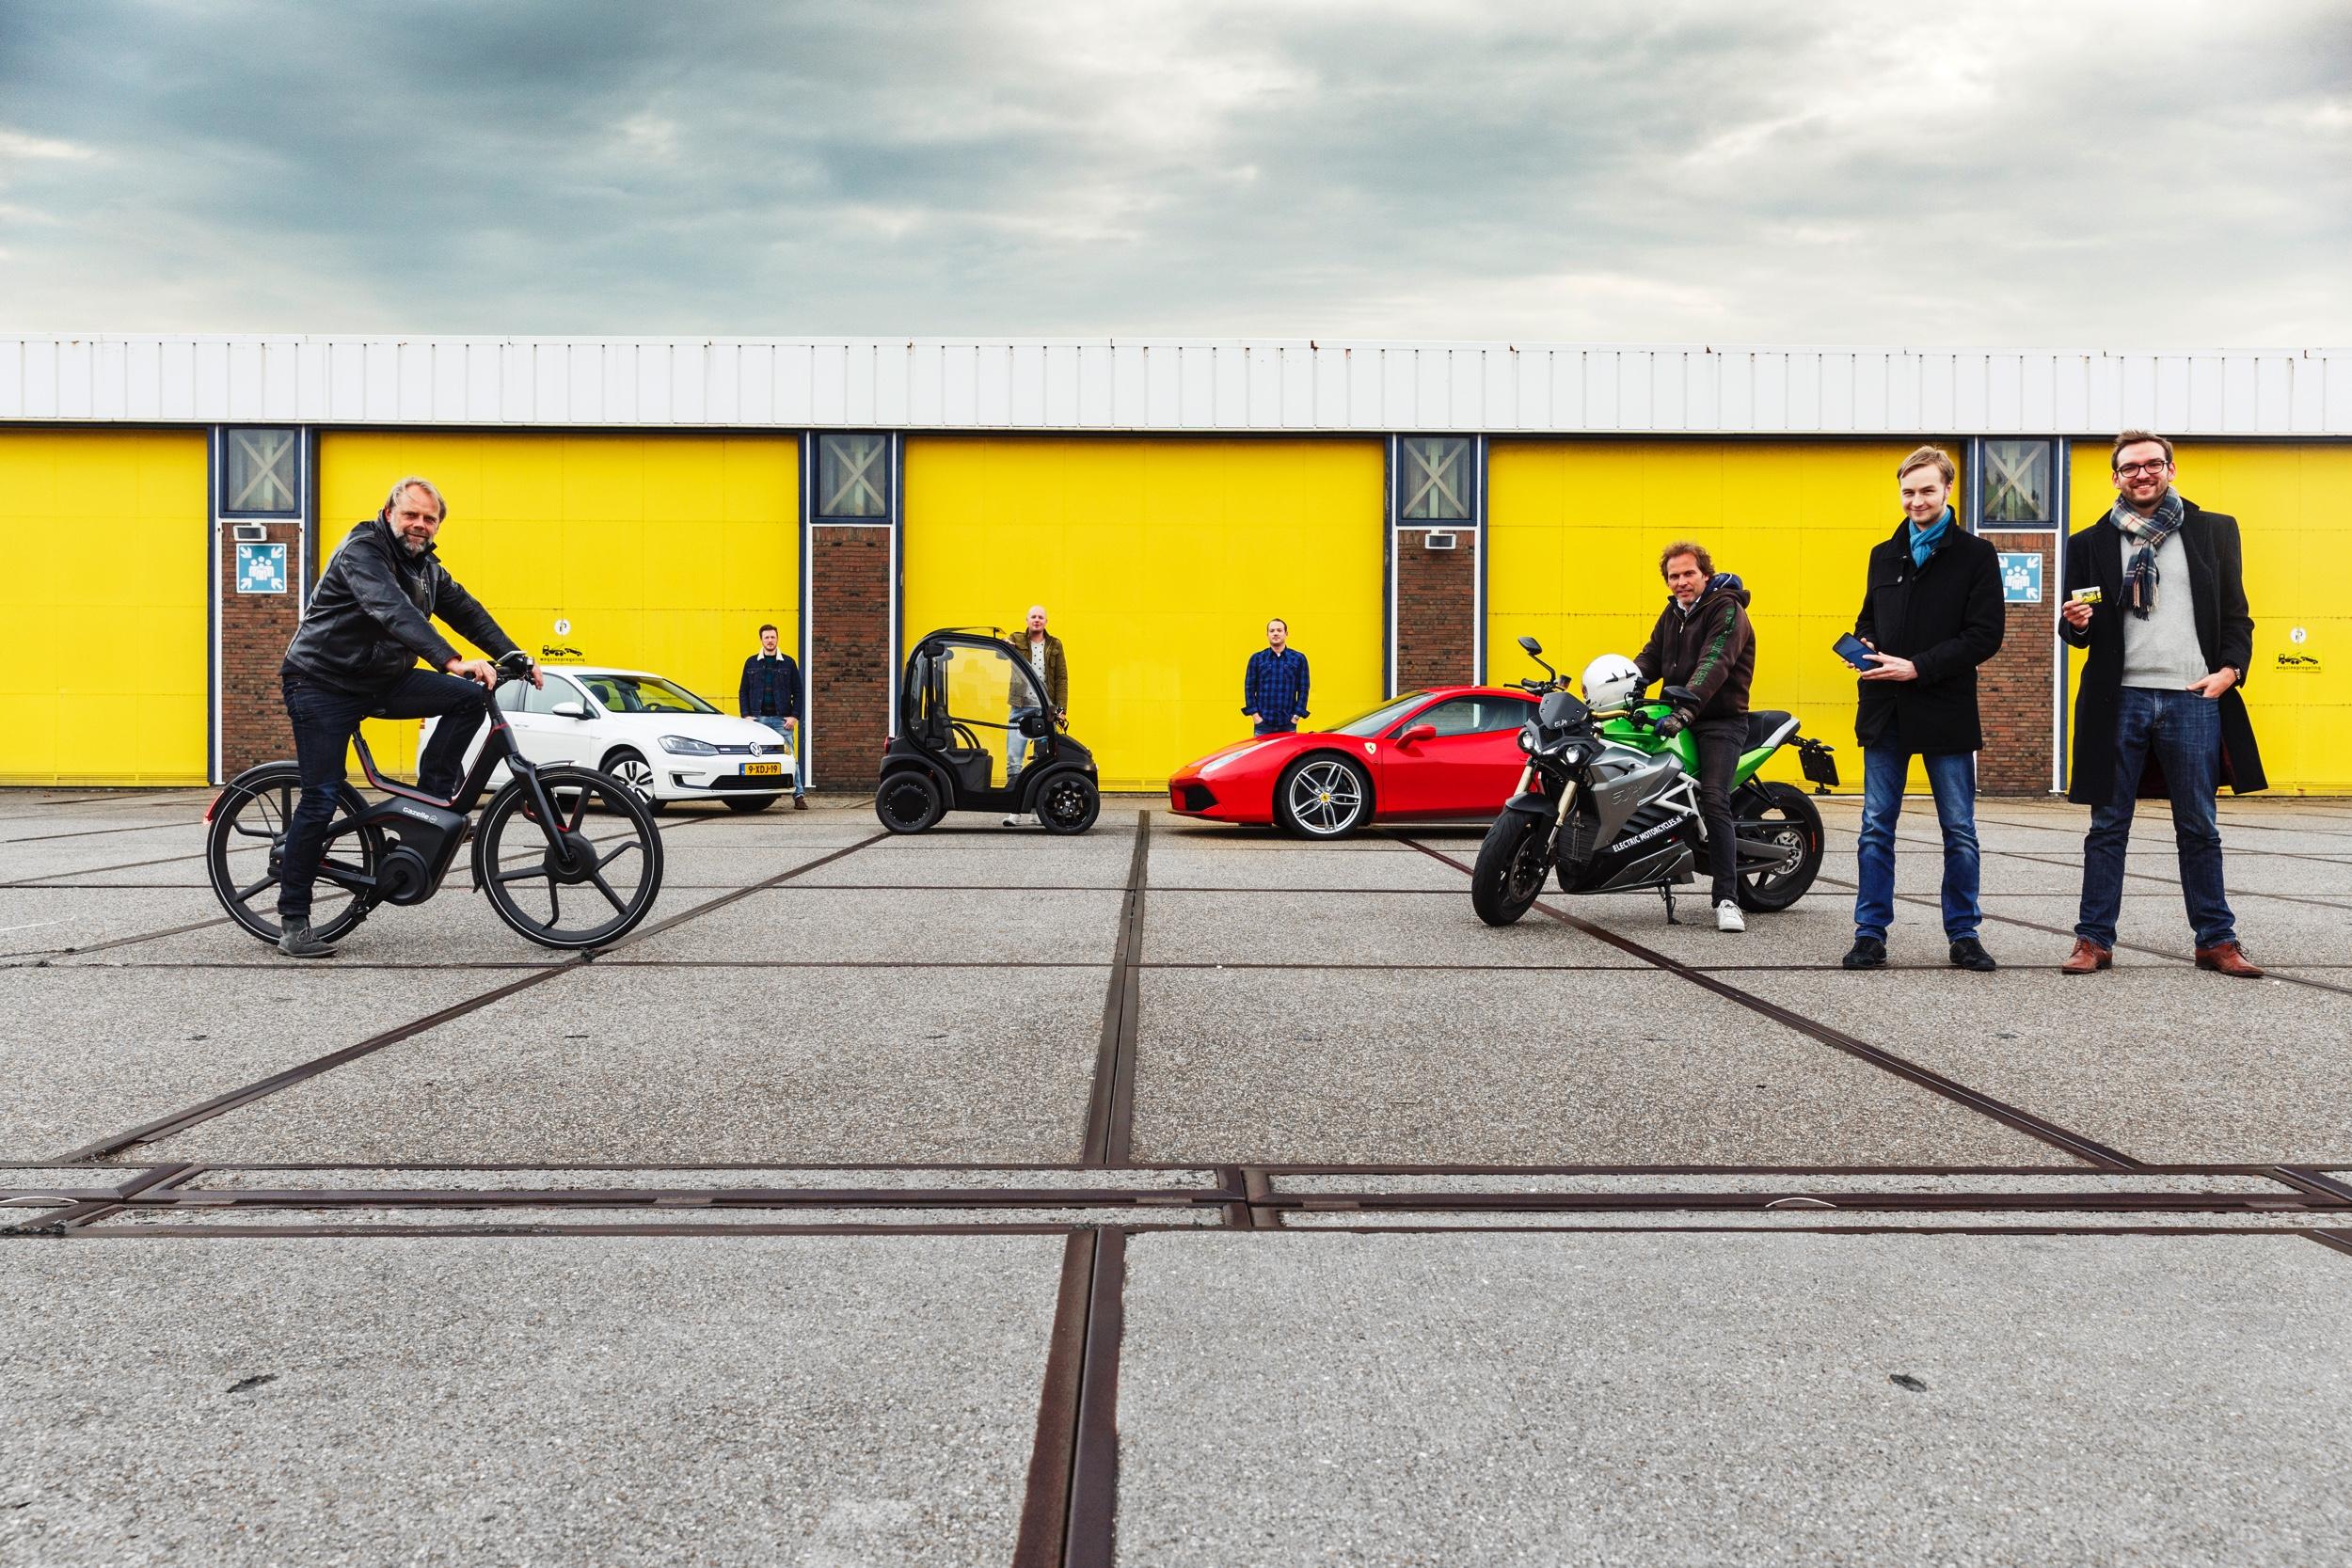 Autovisie Magazine 24 -3- Sneak Preview - Autovisie Mobility Challenge - Jerome Wassenaar